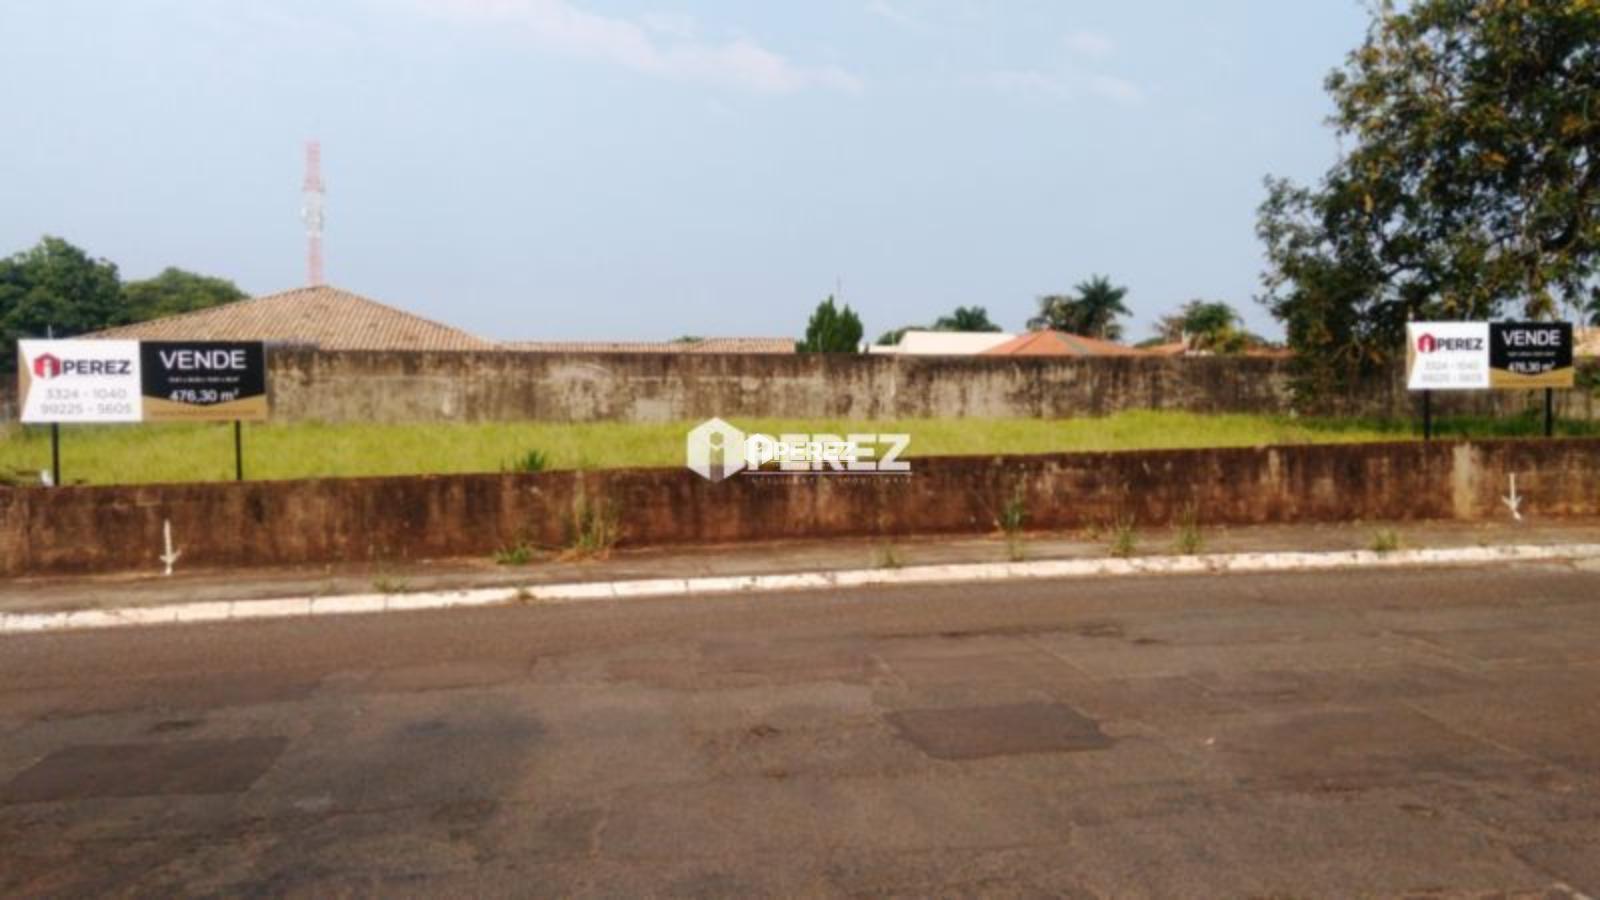 venda-campo-grande-ms-terreno-antonio-oliveira-lima-itanhanga-park-perez-imoveis